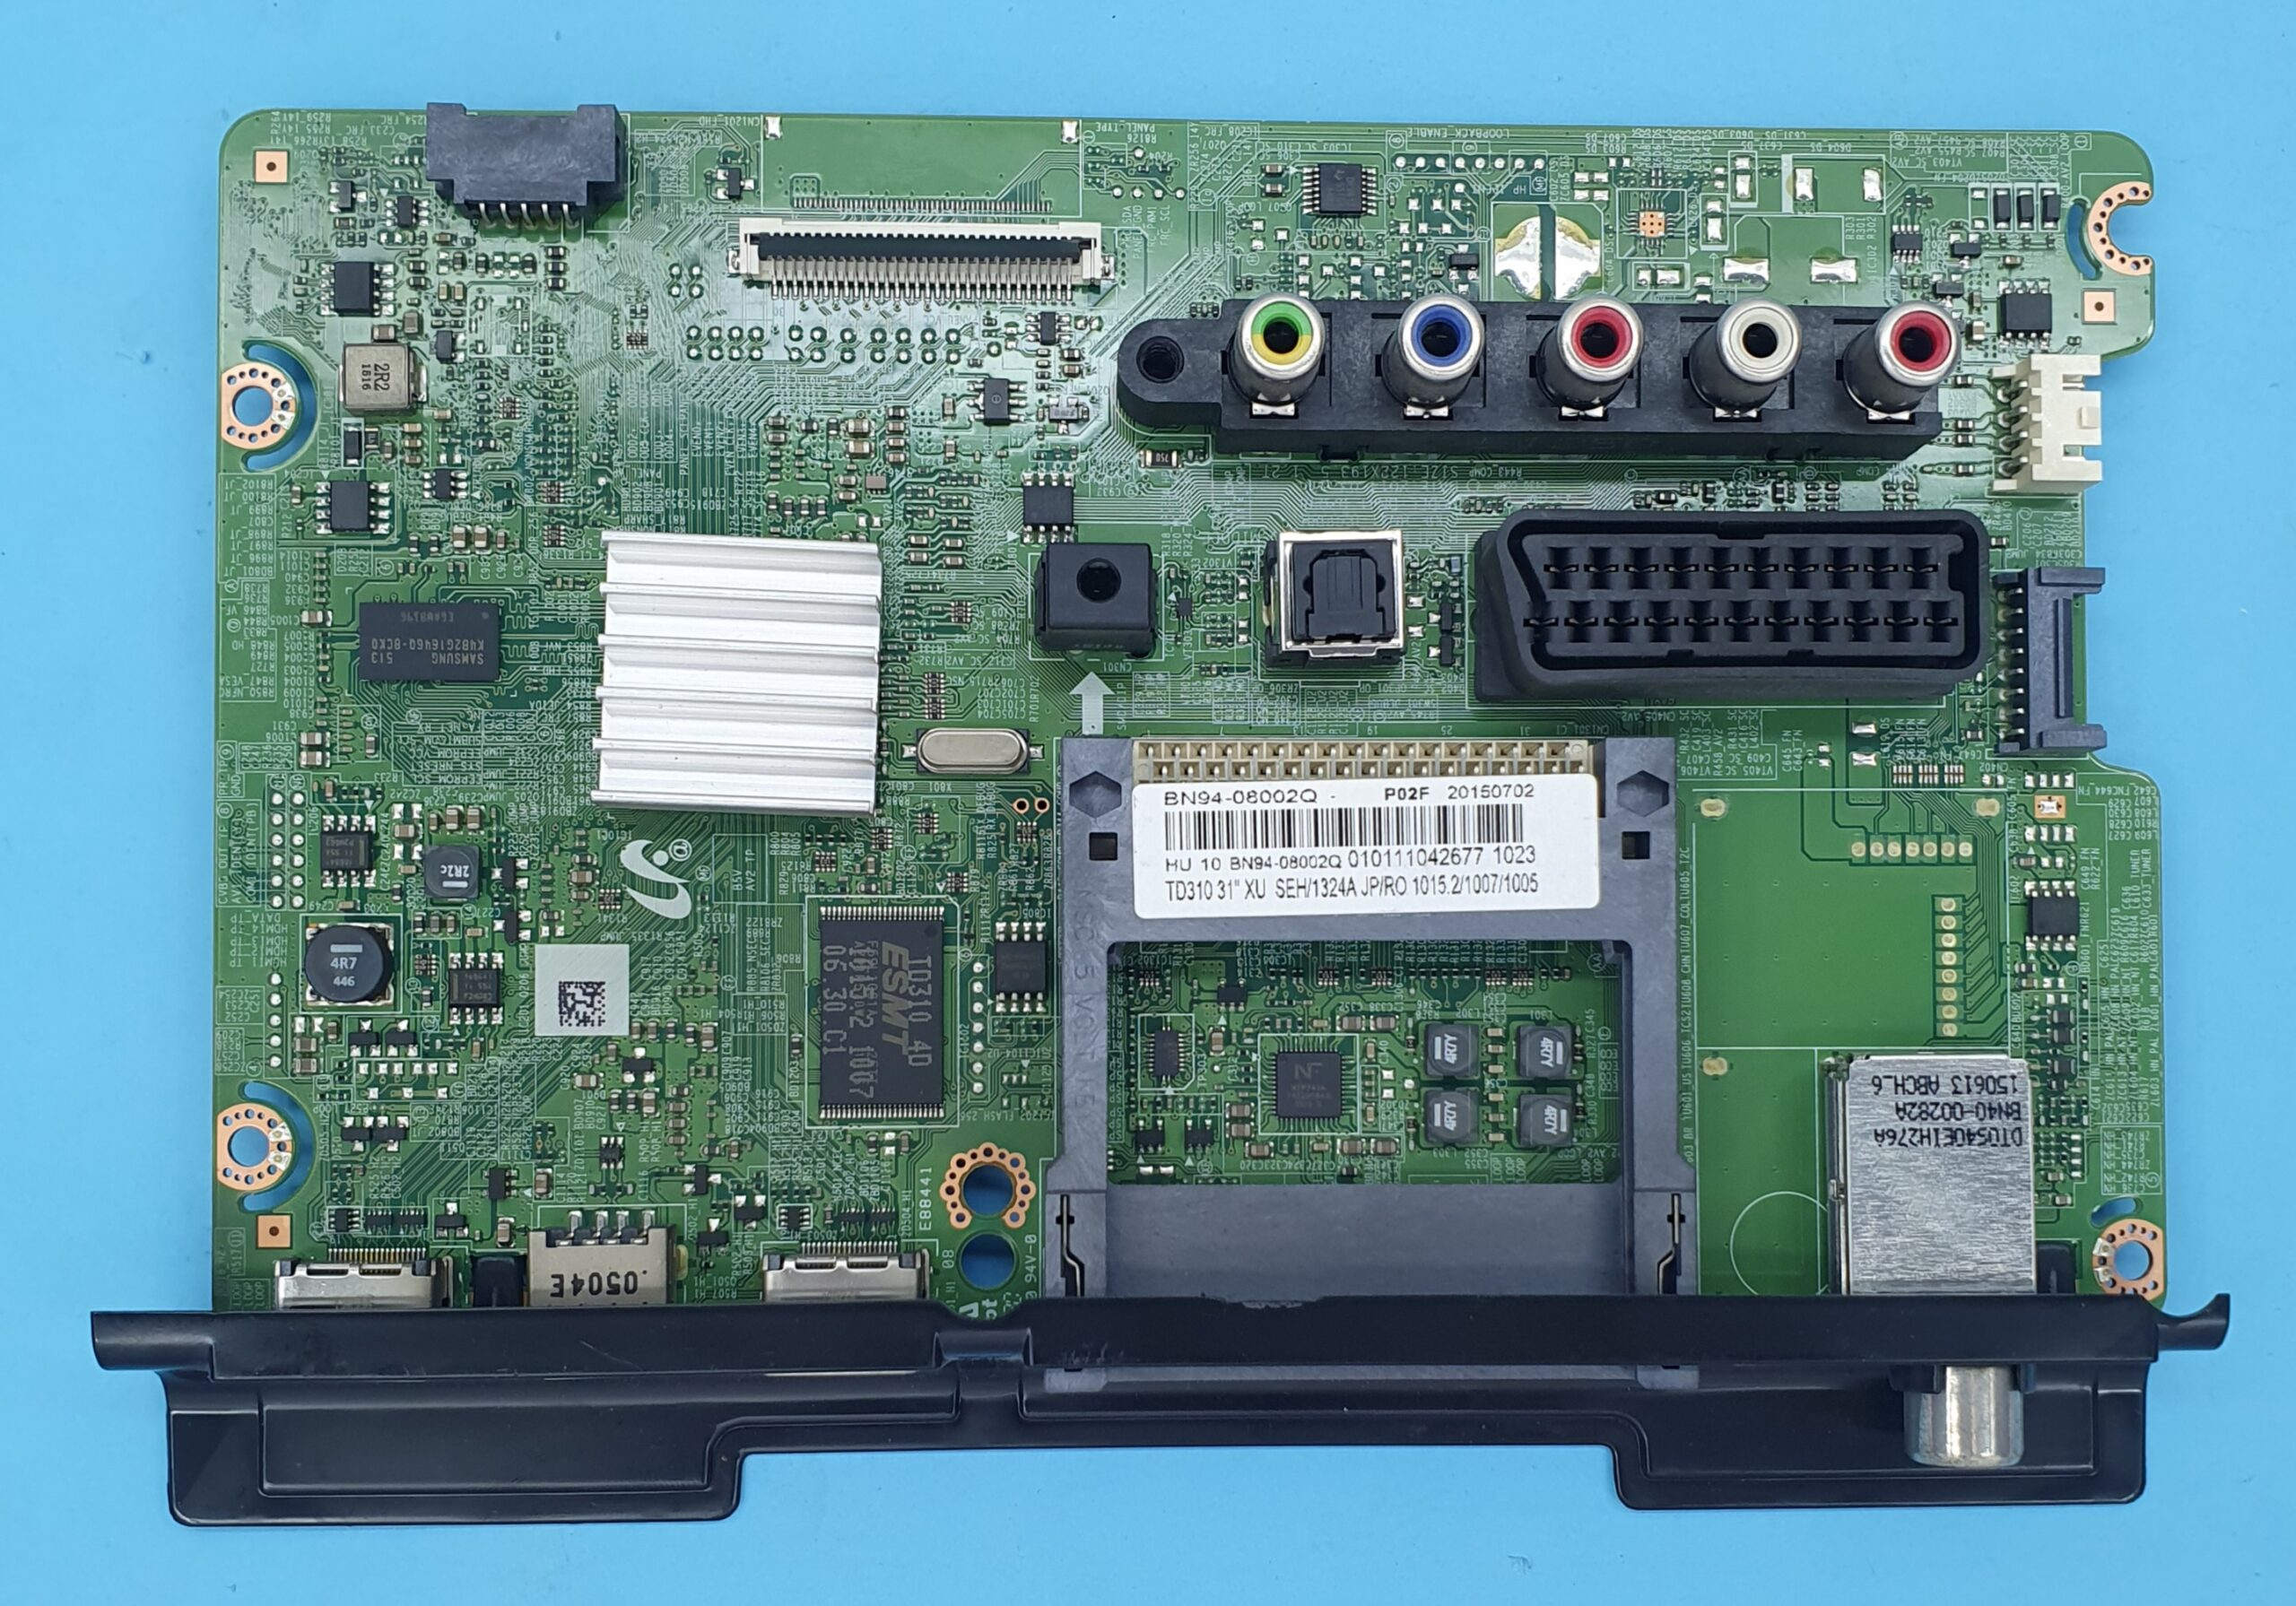 BN94-08002Q Samsung Anakart (KDV DAHİL = 200 TL)